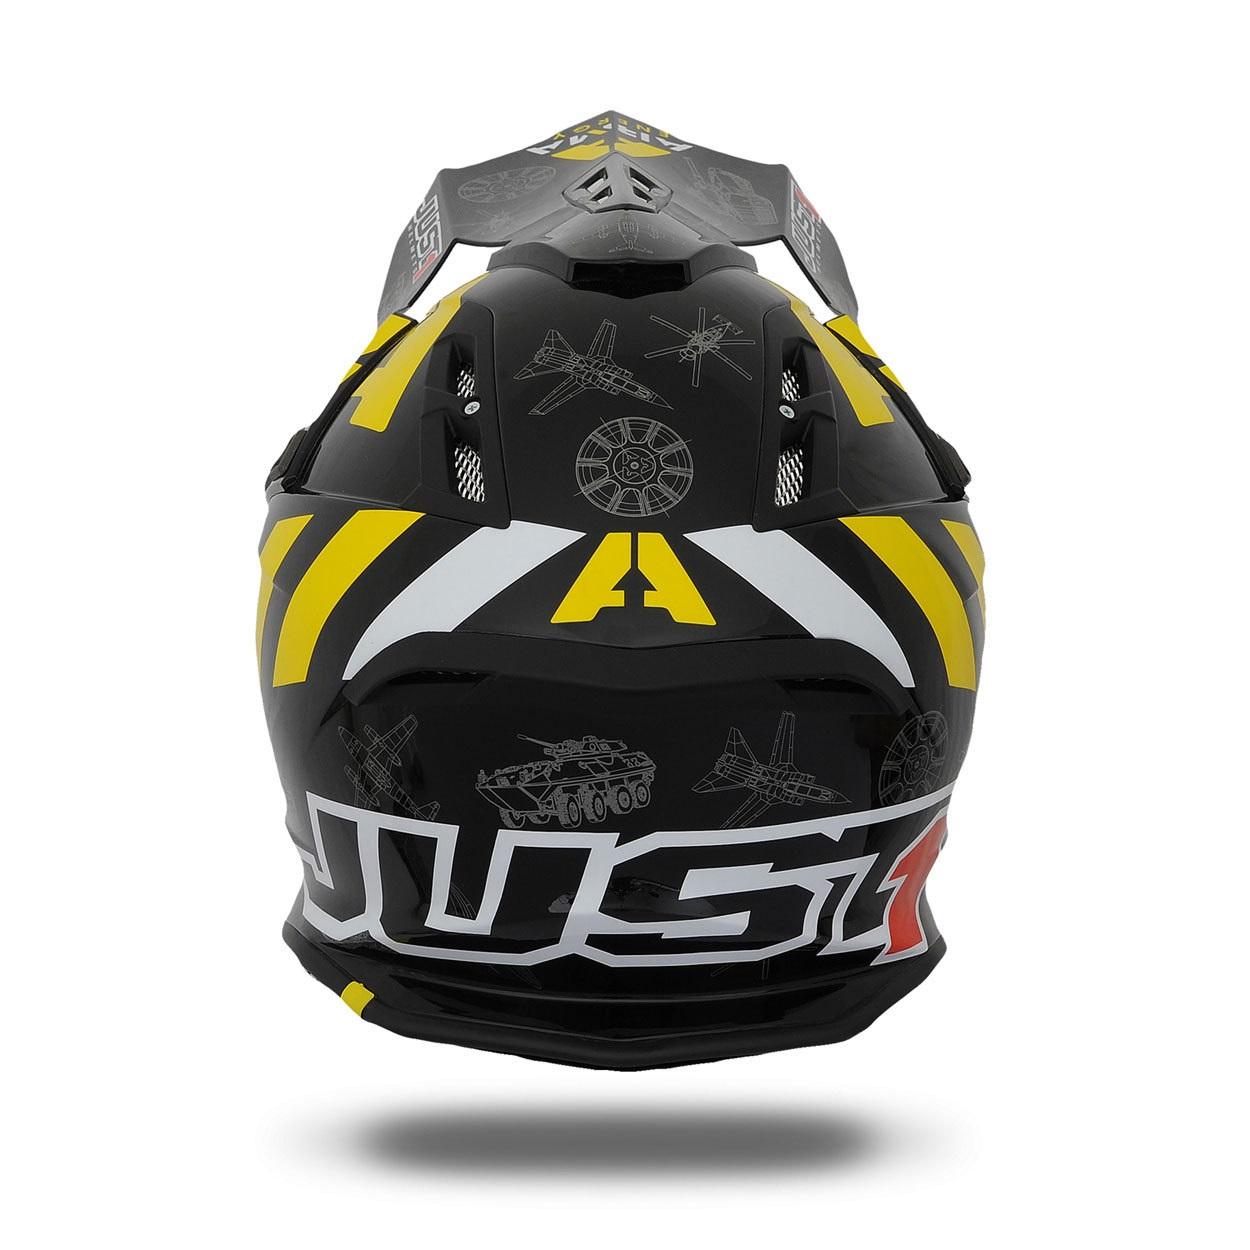 Just1 Helmets